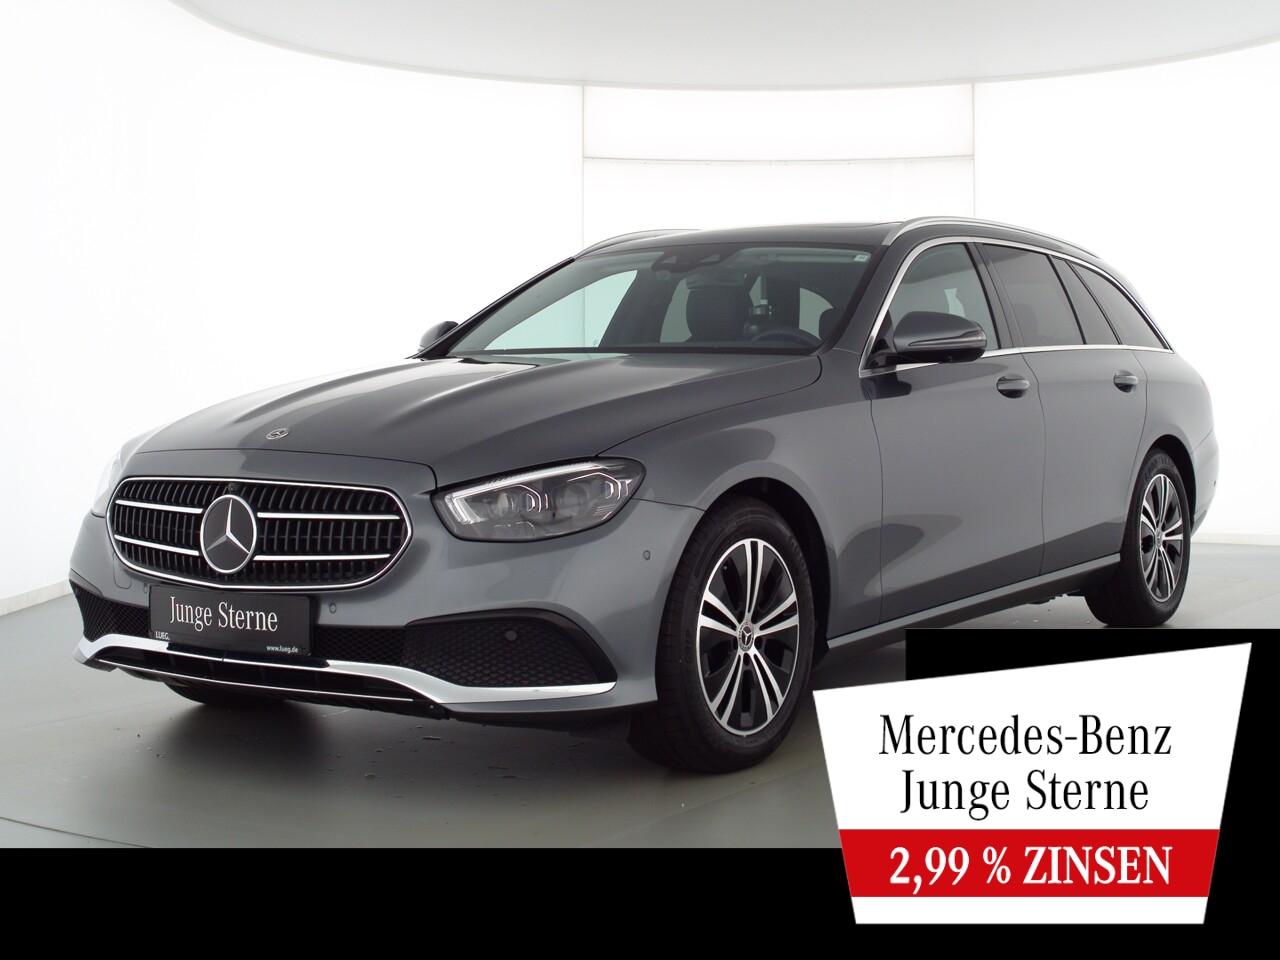 Mercedes-Benz E 220 d T 4M Avantgarde+MBUXHighE+SHD+Mbeam+360°, Jahr 2020, Diesel